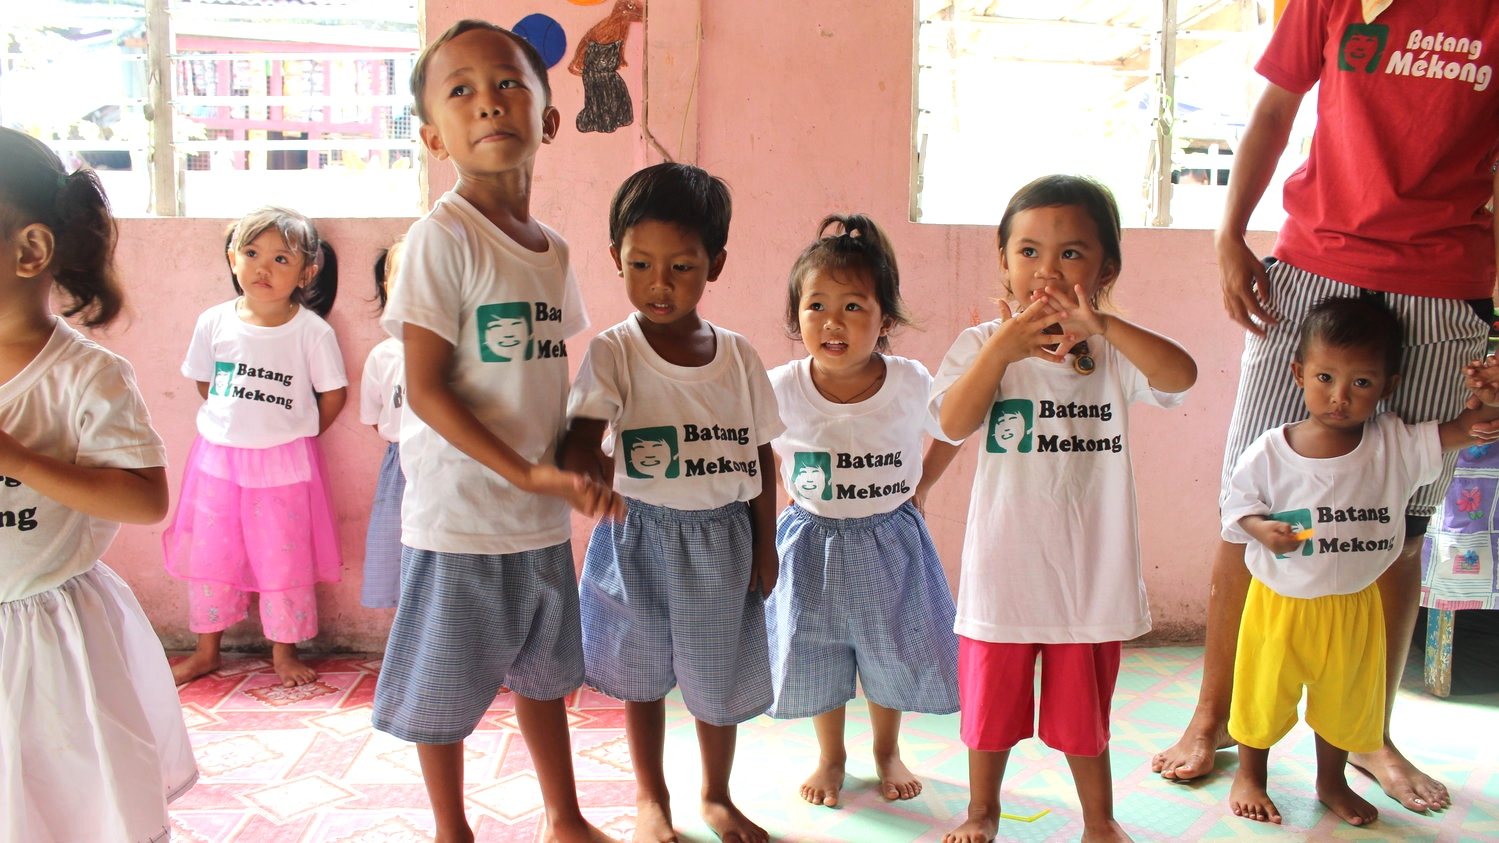 Enfants+du+Mekong.jpg